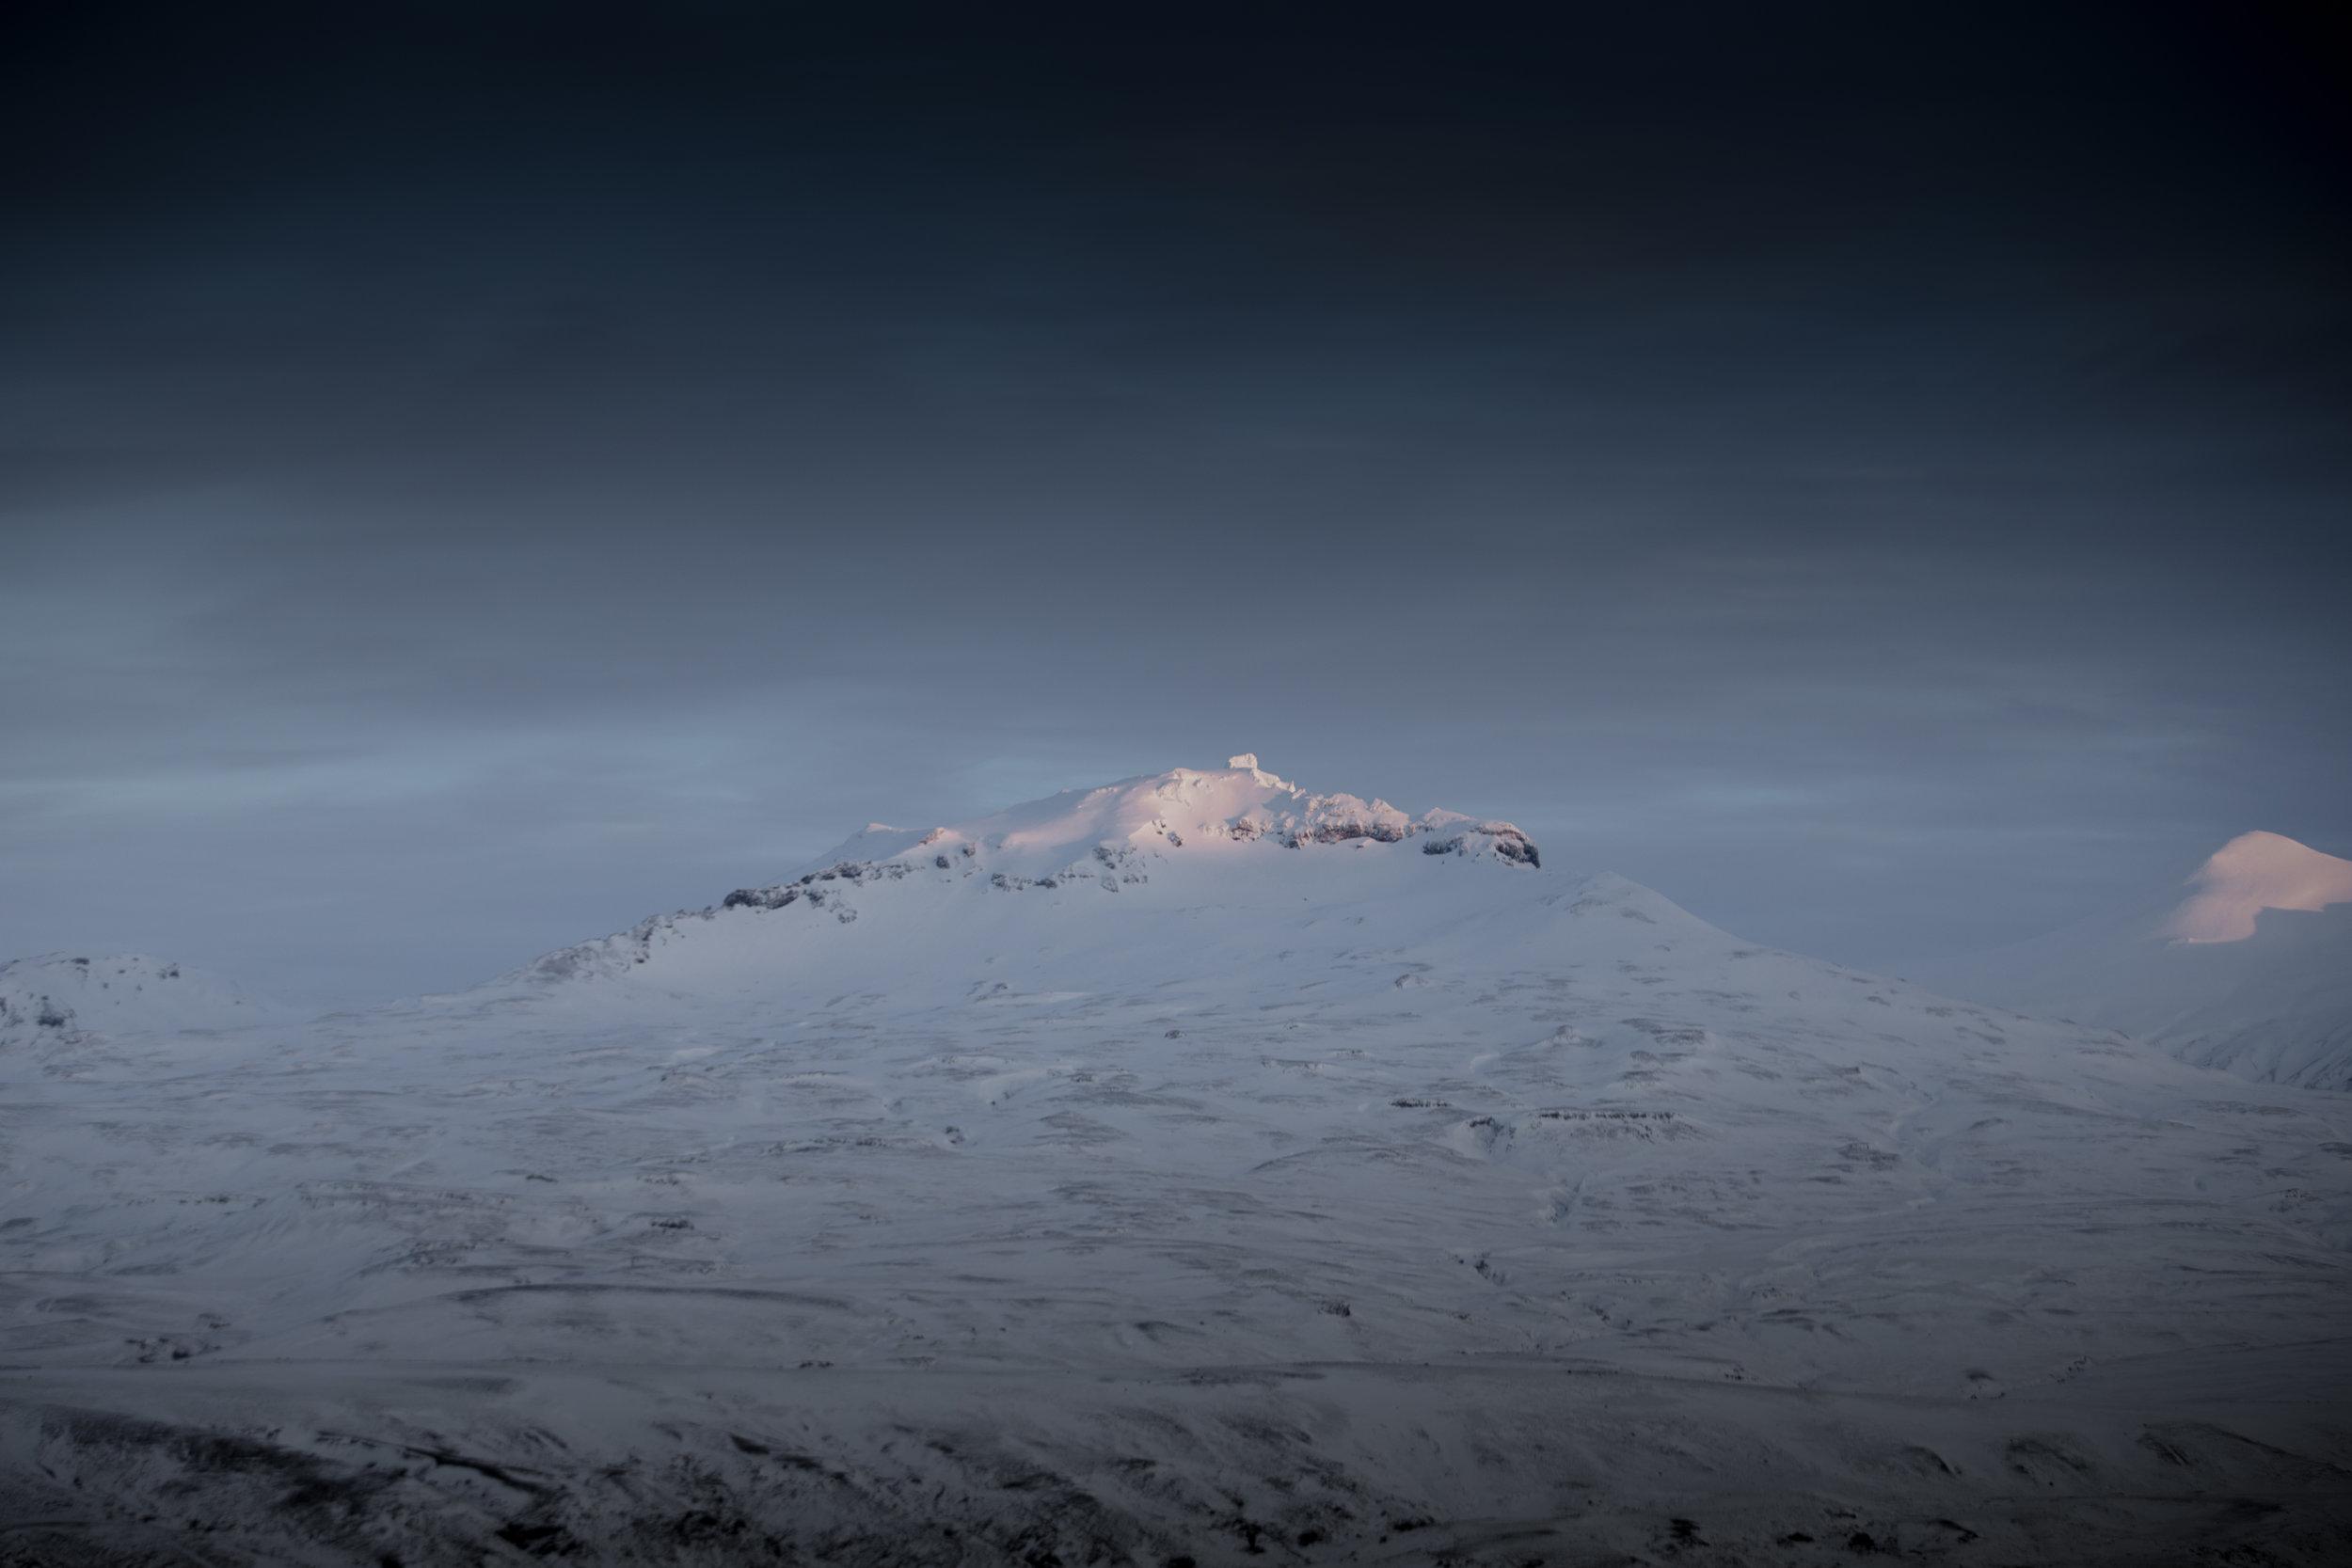 jermiah-schuster-iceland-193.jpg